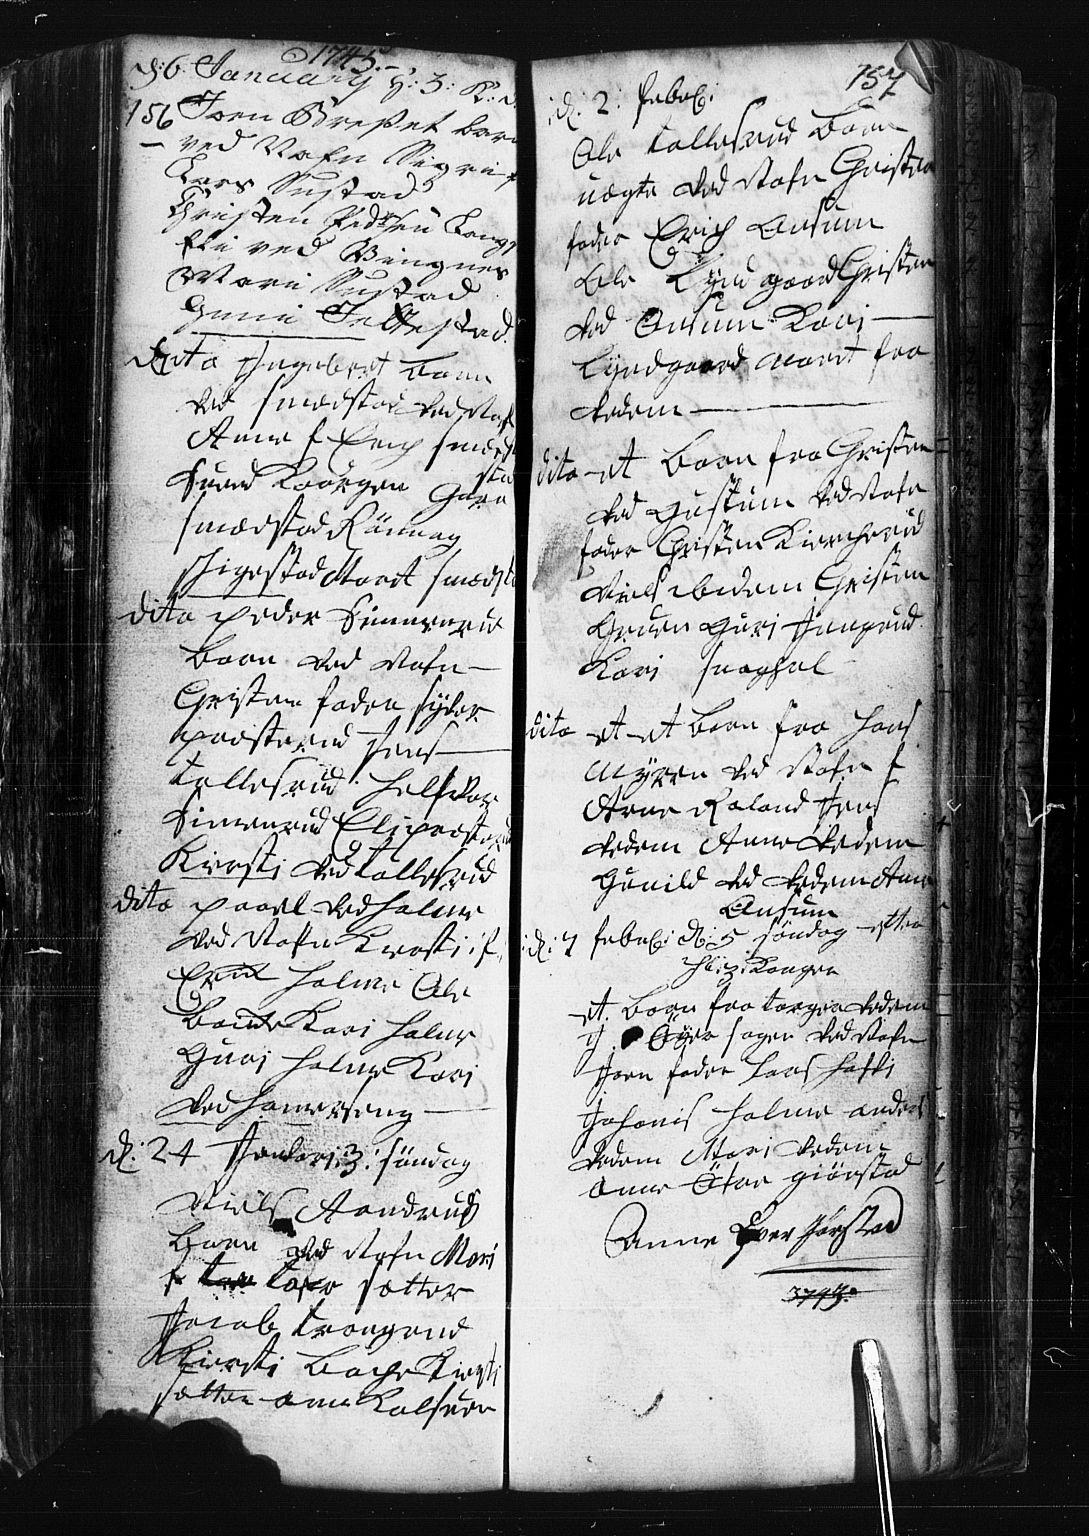 SAH, Fåberg prestekontor, Klokkerbok nr. 1, 1727-1767, s. 156-157